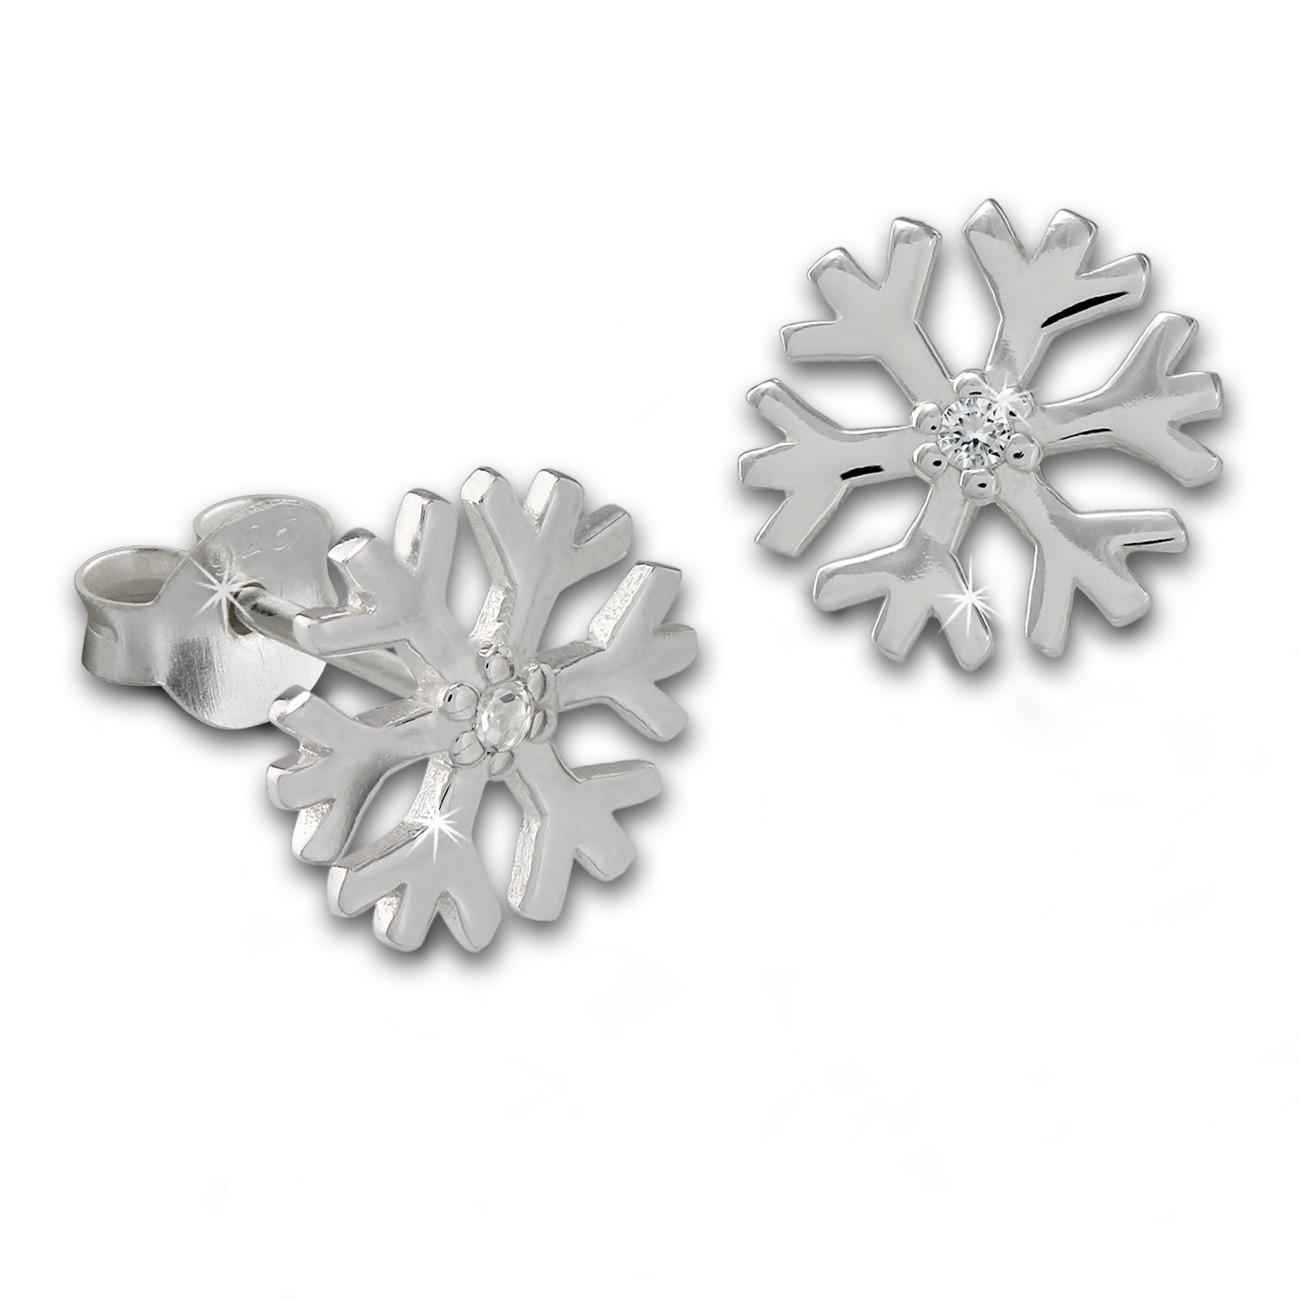 SilberDream Ohrstecker Schneeflocke Zirkonia 925er Silber Ohrring SDO8032W